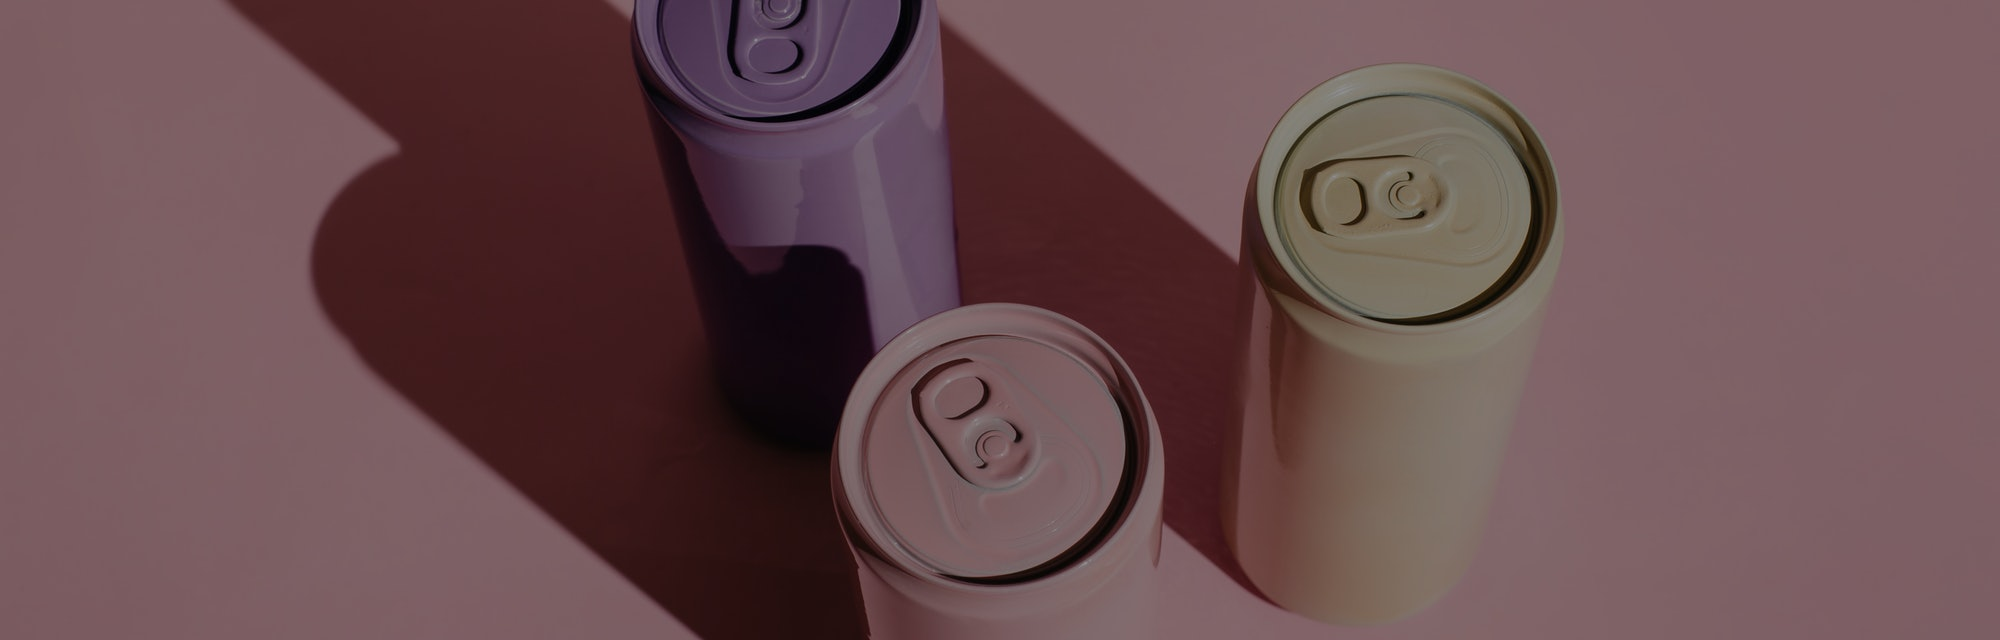 Pink, beige, lilac aluminum drink cans on pink background. Minimal creative still life. Zero waste, ...